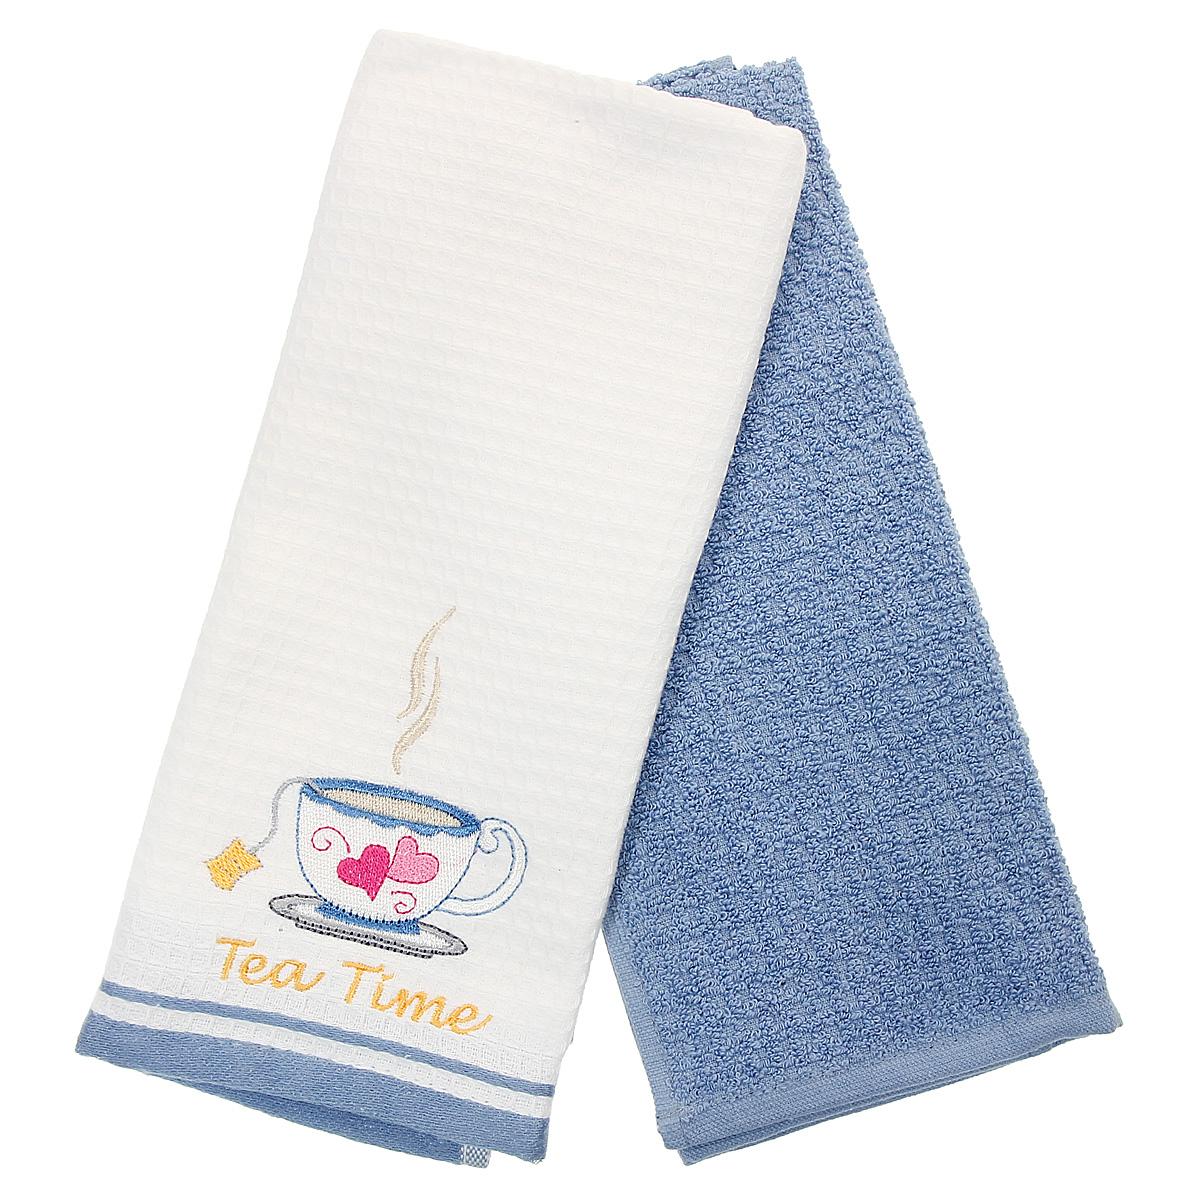 Набор кухонных полотенец Coronet Чашка, цвет: белый, синий, 40 х 60 см, 2 штК-МП-5010-05-03-03